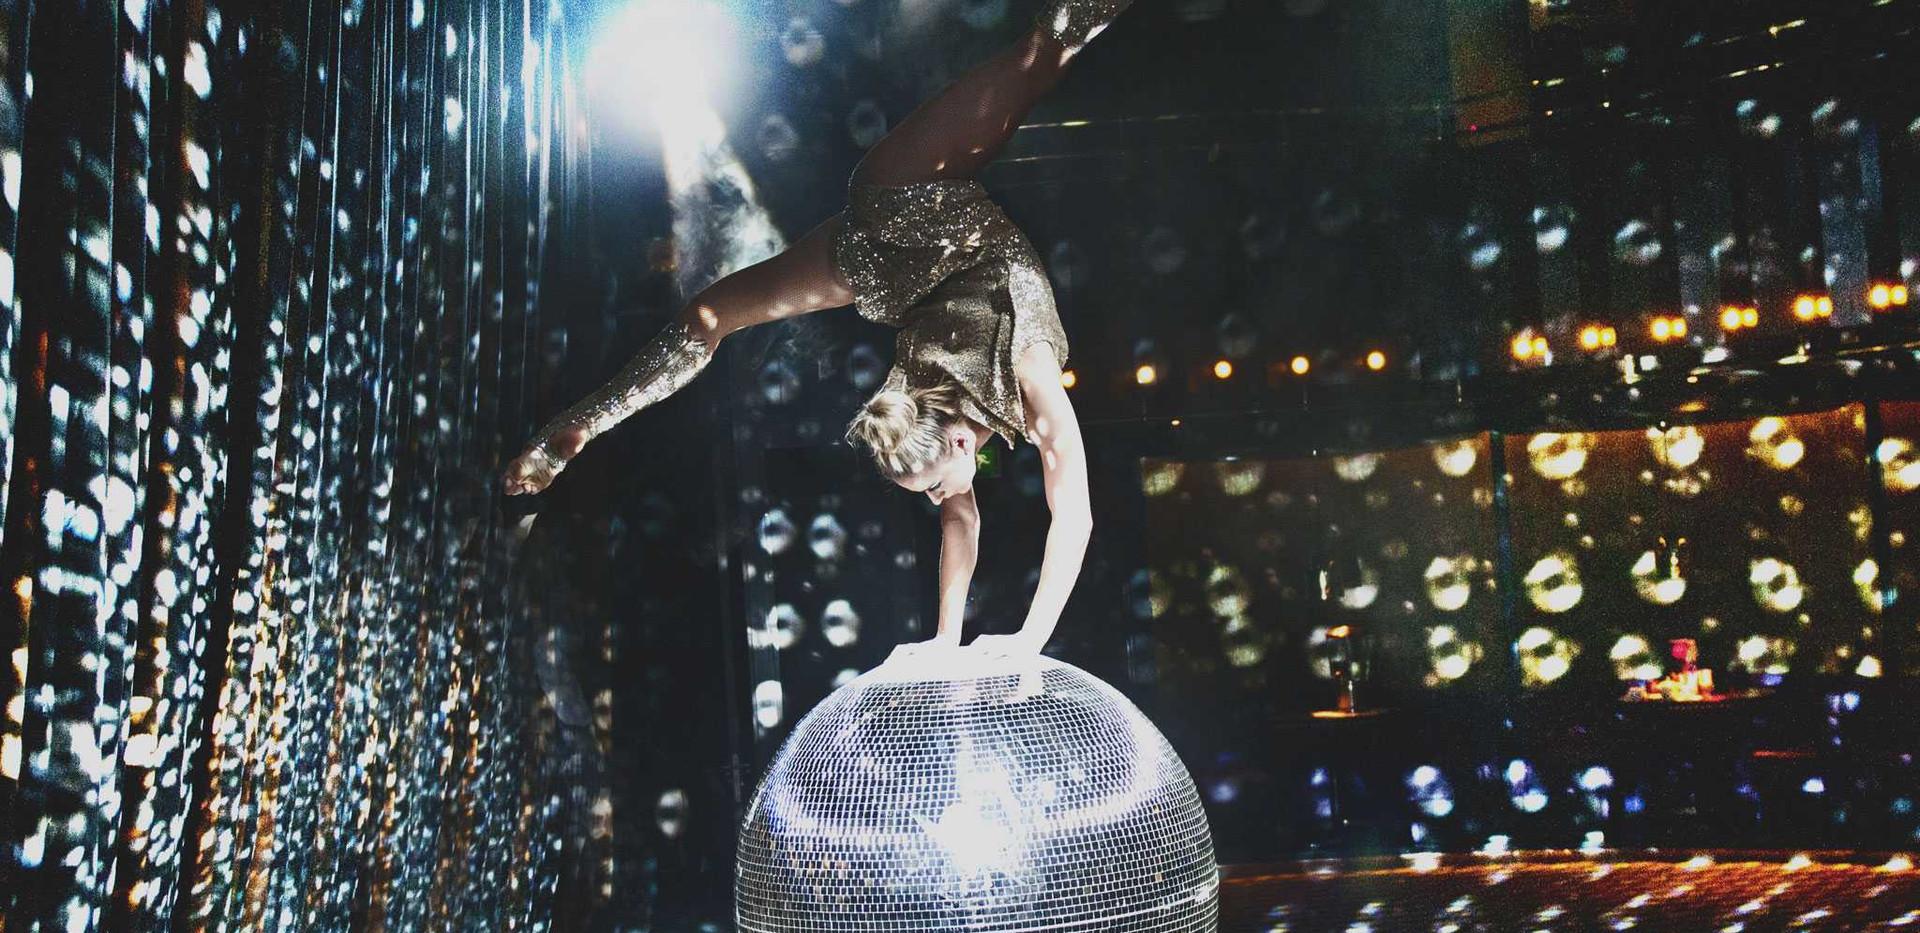 Book glitterball acrobat act London